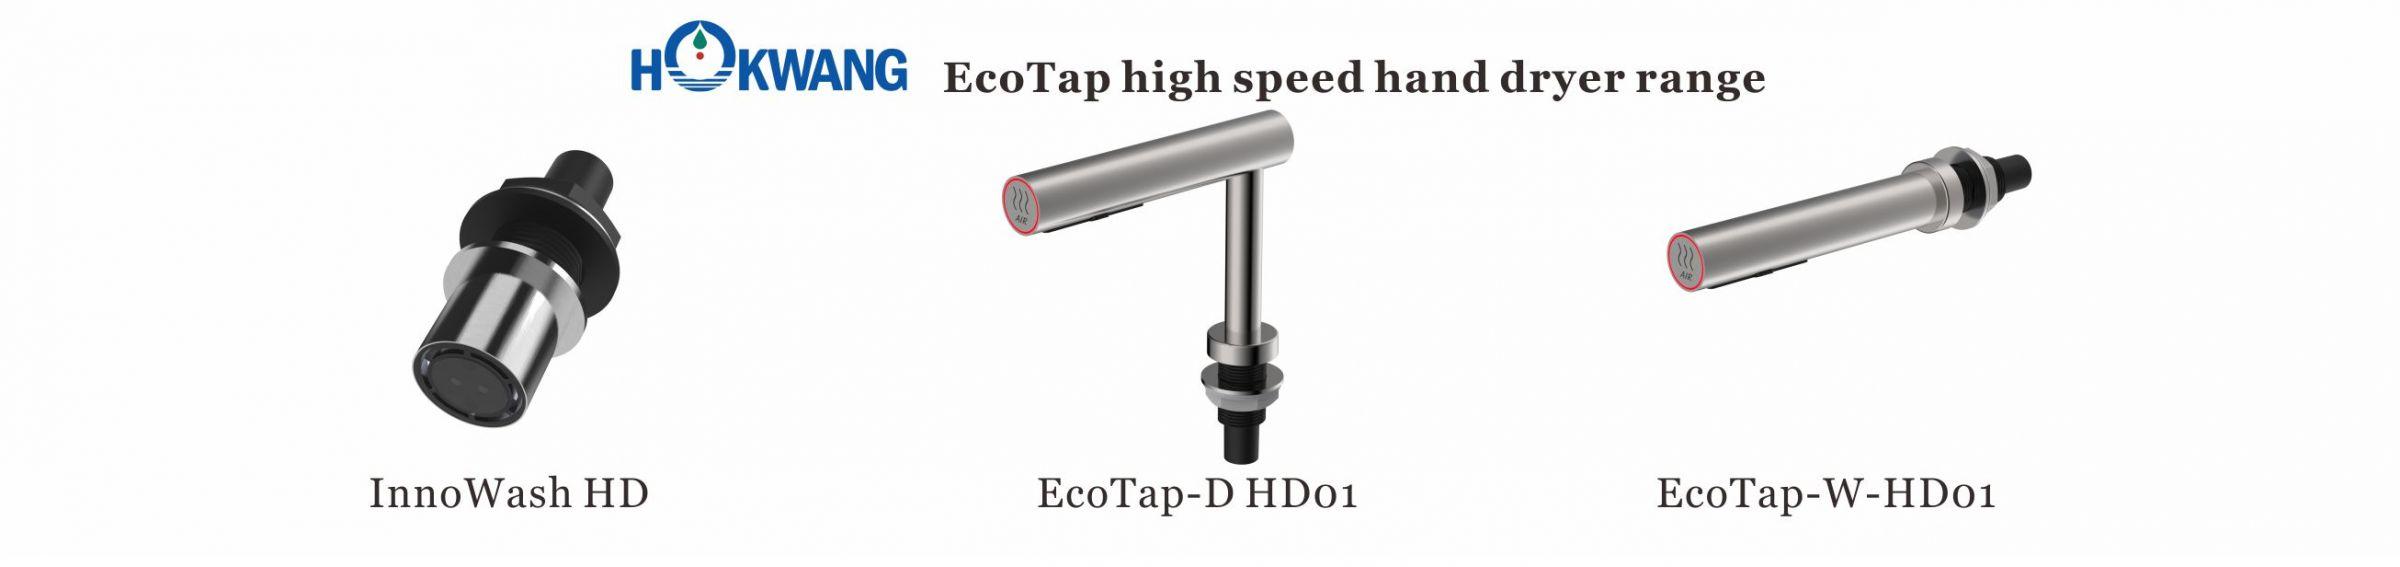 EcoTap High Speed Hand Dryer